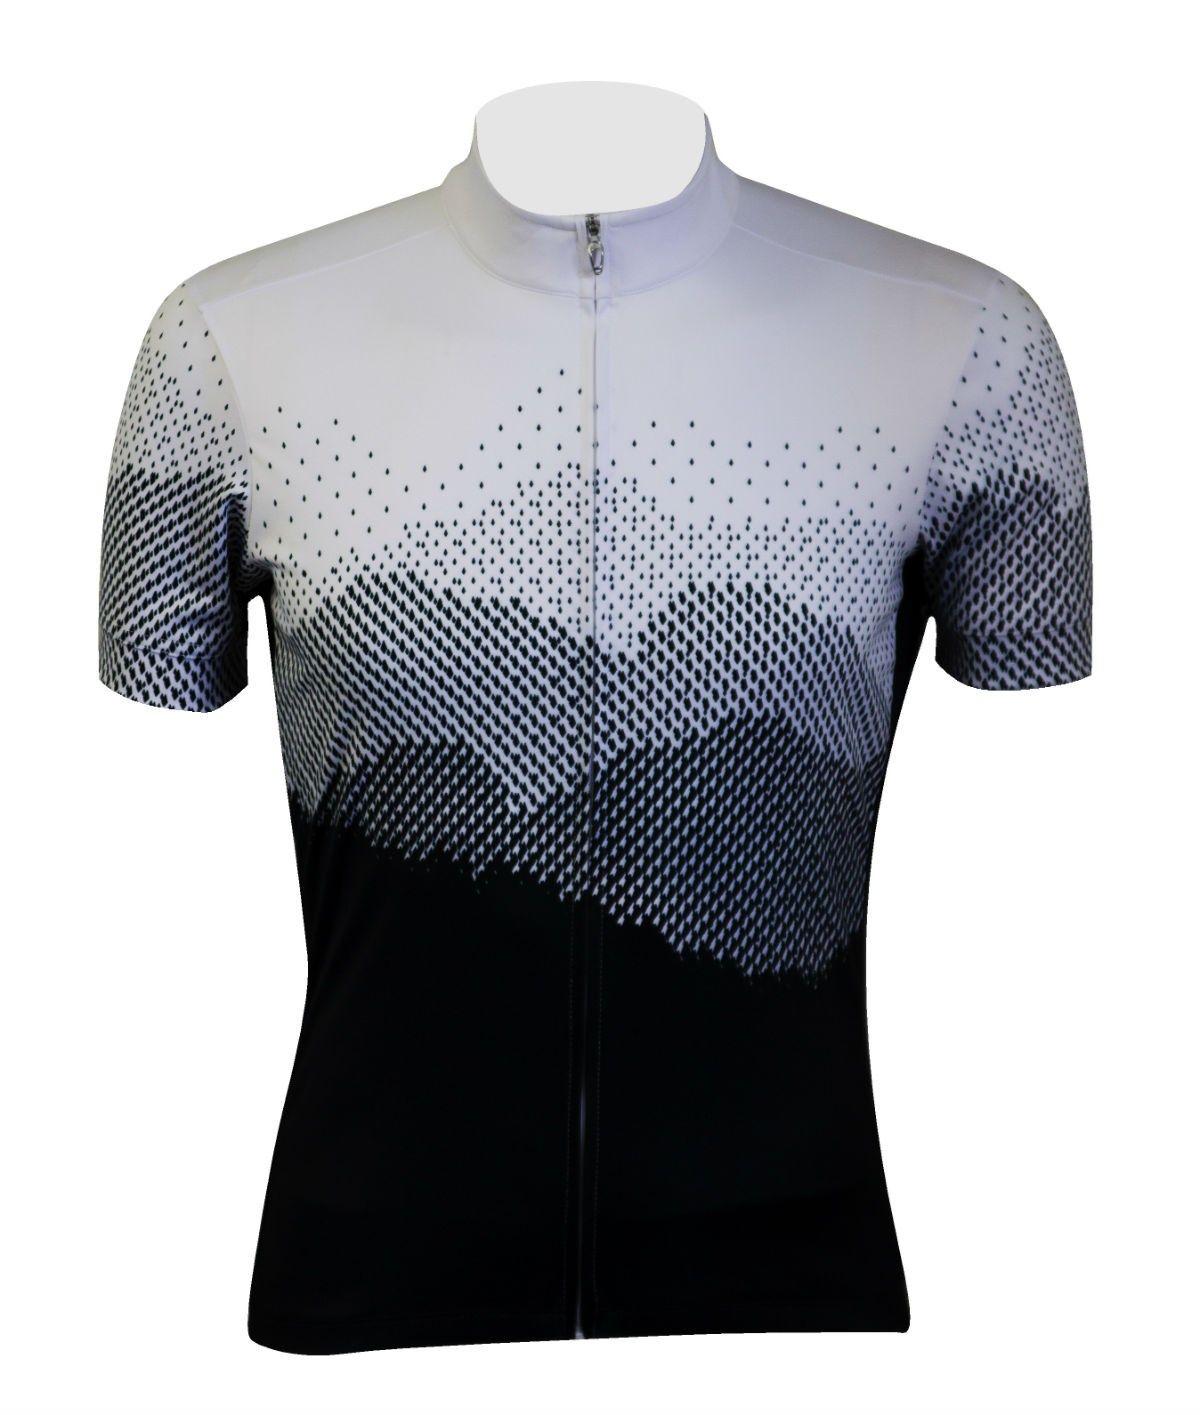 9d0ff5e06 Rutland Cycling   Specialized RBX Sport Ridge Line Jersey Black ...